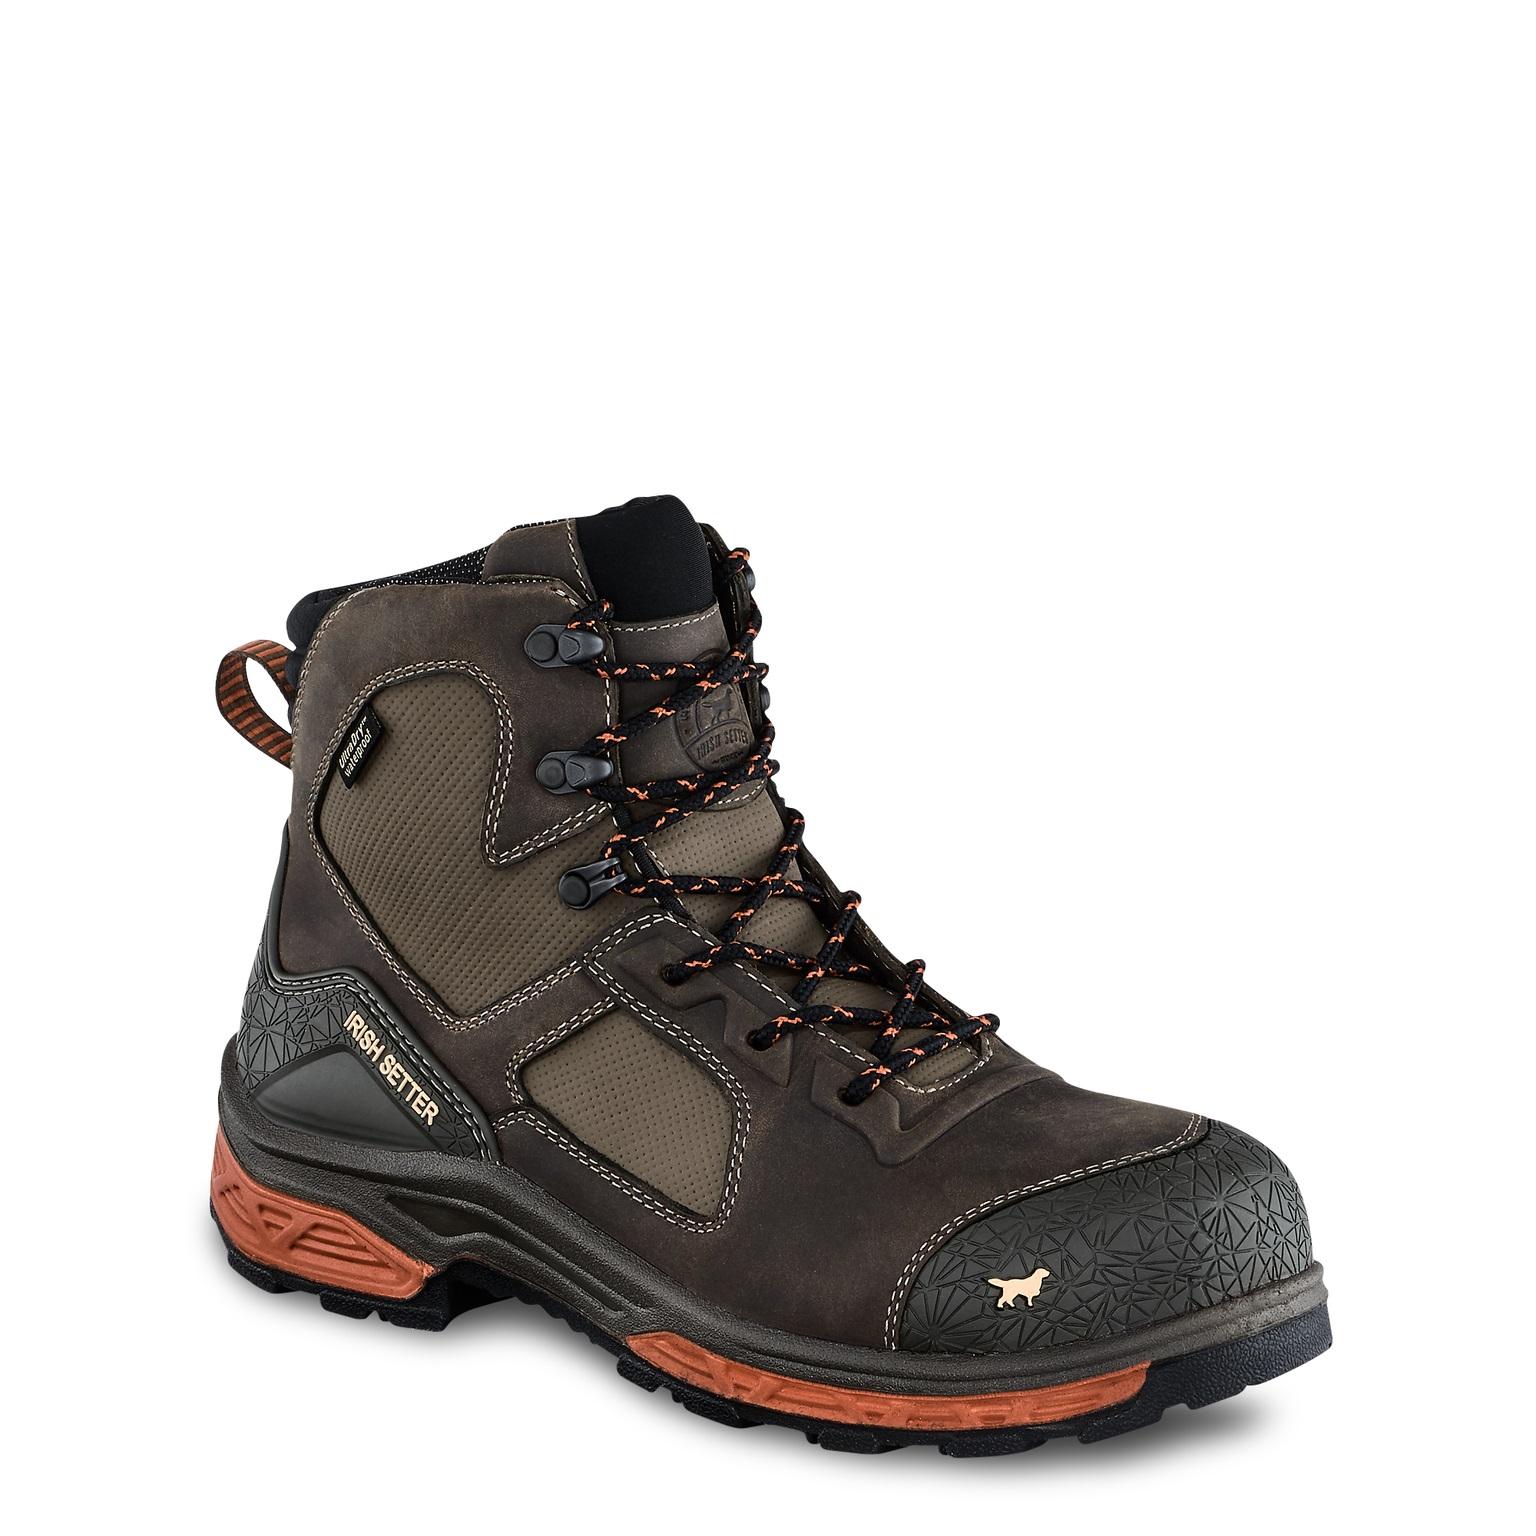 63b992a9784 Irish Setter Mens Kasota Work Boots